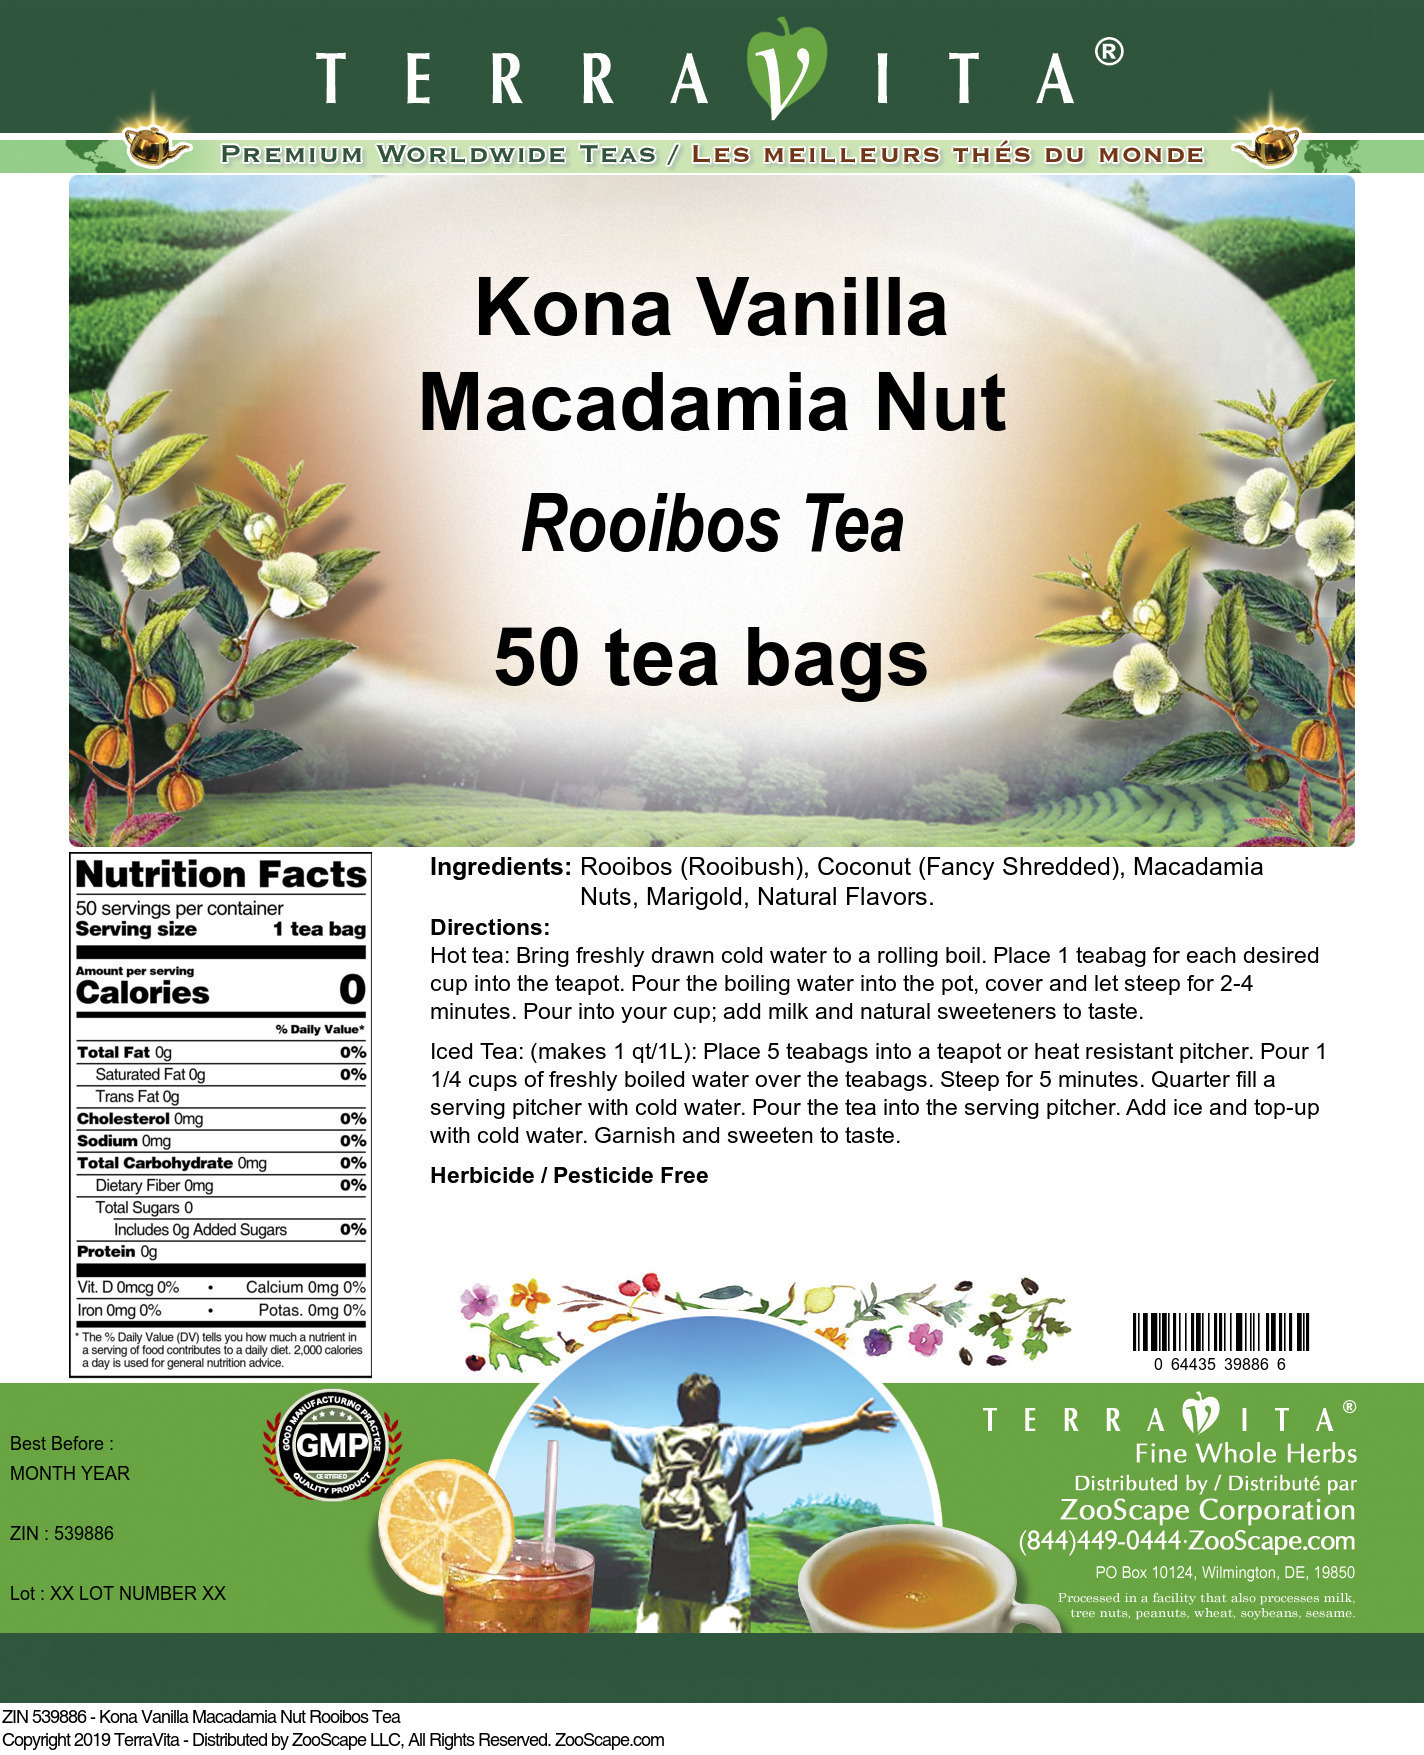 Kona Vanilla Macadamia Nut Rooibos Tea